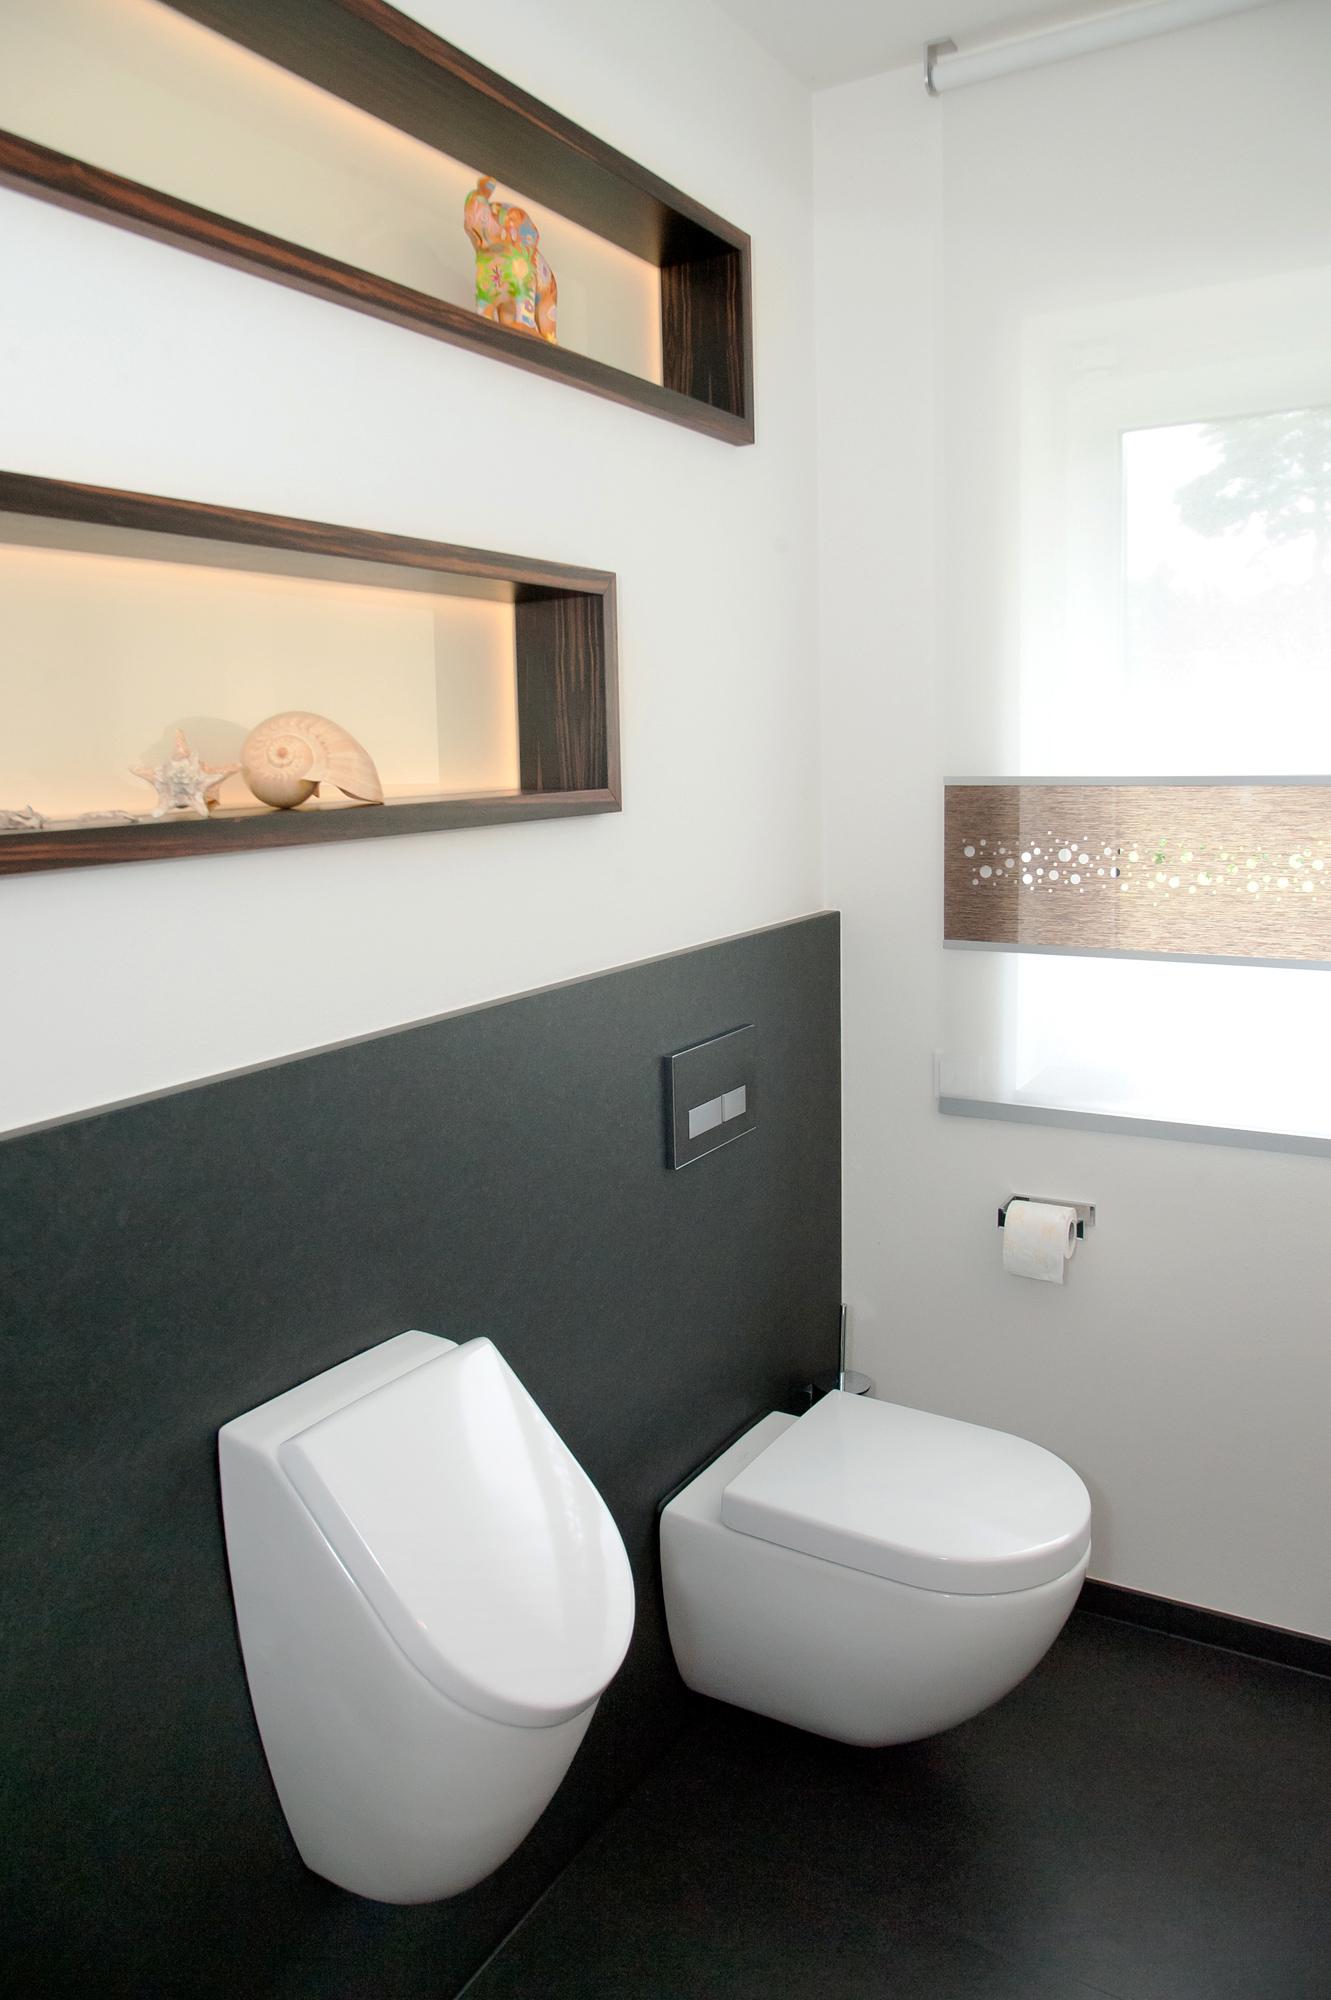 Groot toilet met urinoir!